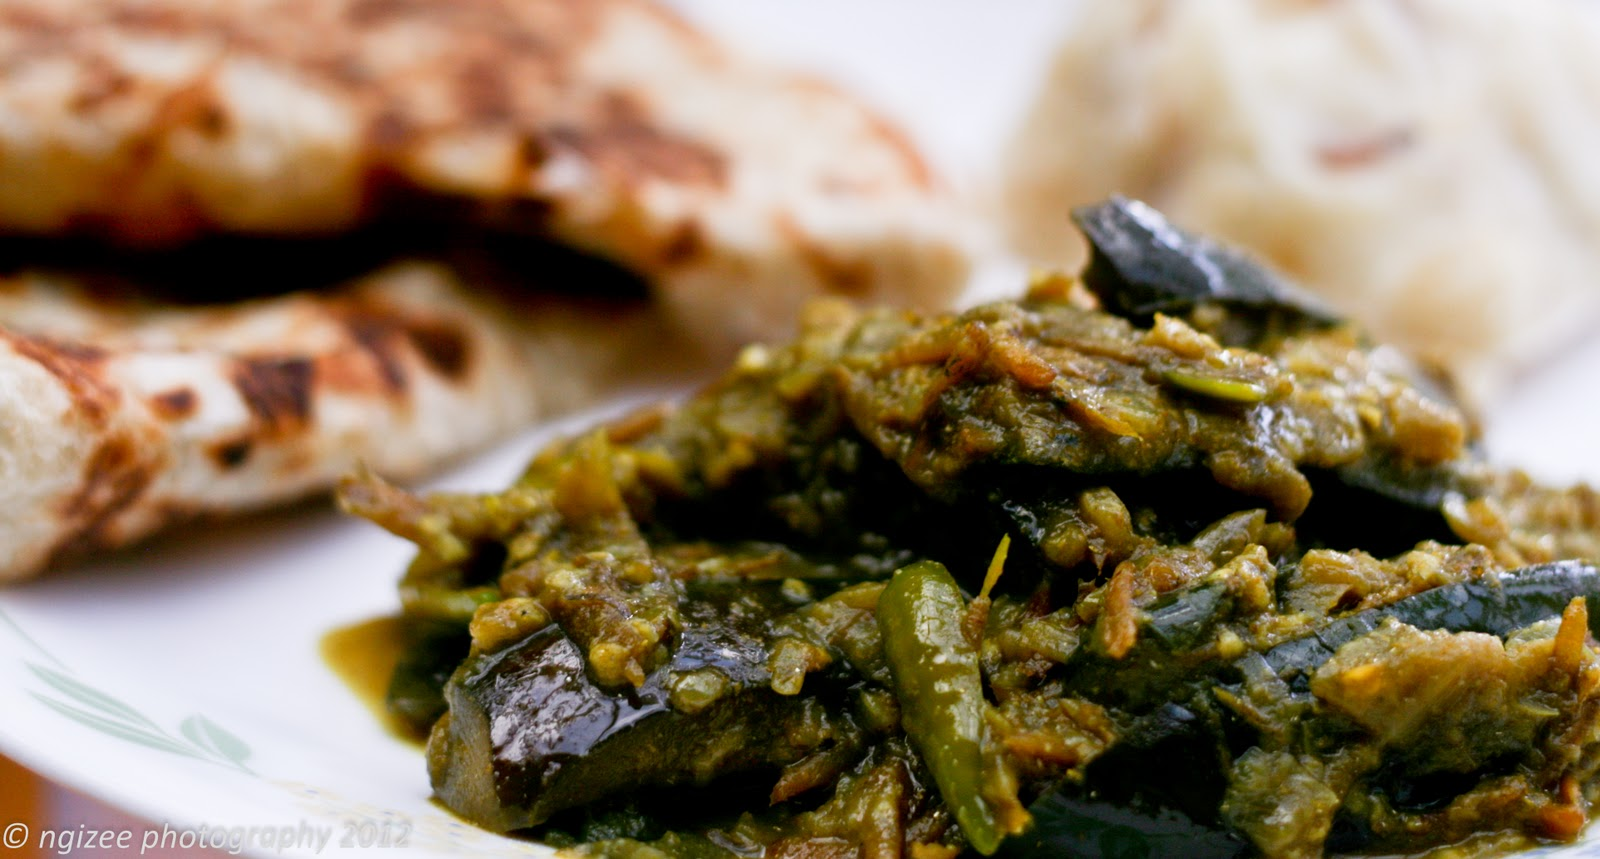 I am no food criticbut eggplant with dried fishngladeshi bangladeshi baingan shutki forumfinder Gallery